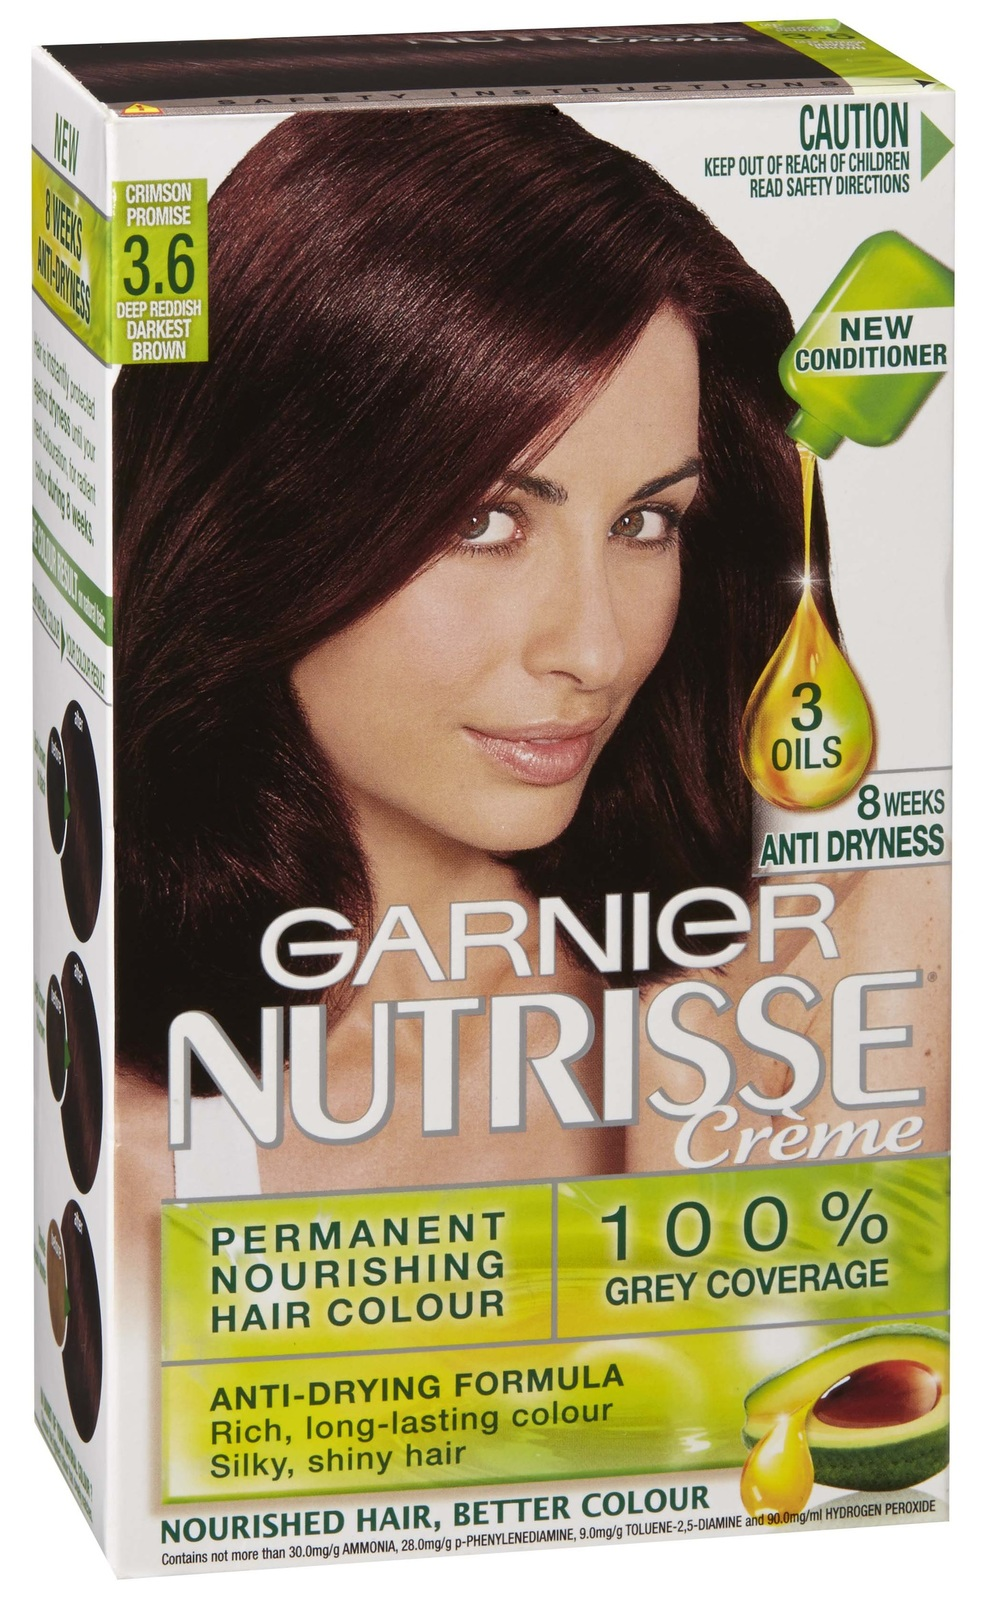 Buy garnier nutrisse hair colour 36 crimson promise at mighty ape nz garnier nutrisse permanent nourishing hair colour 36 crimson promise image nvjuhfo Gallery